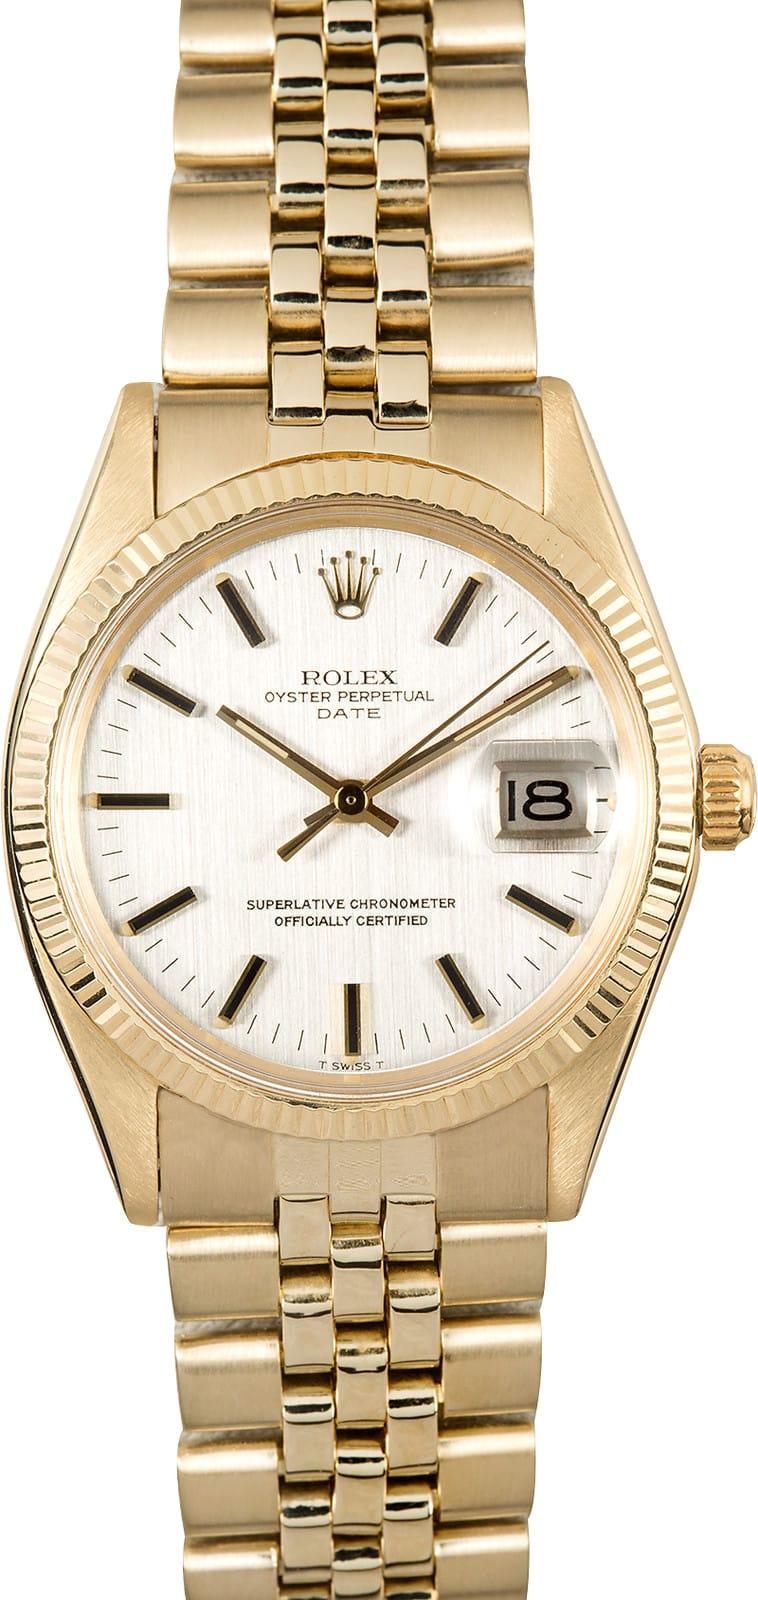 Used Rolex Daytona >> Rolex Date 1503 Yellow Gold